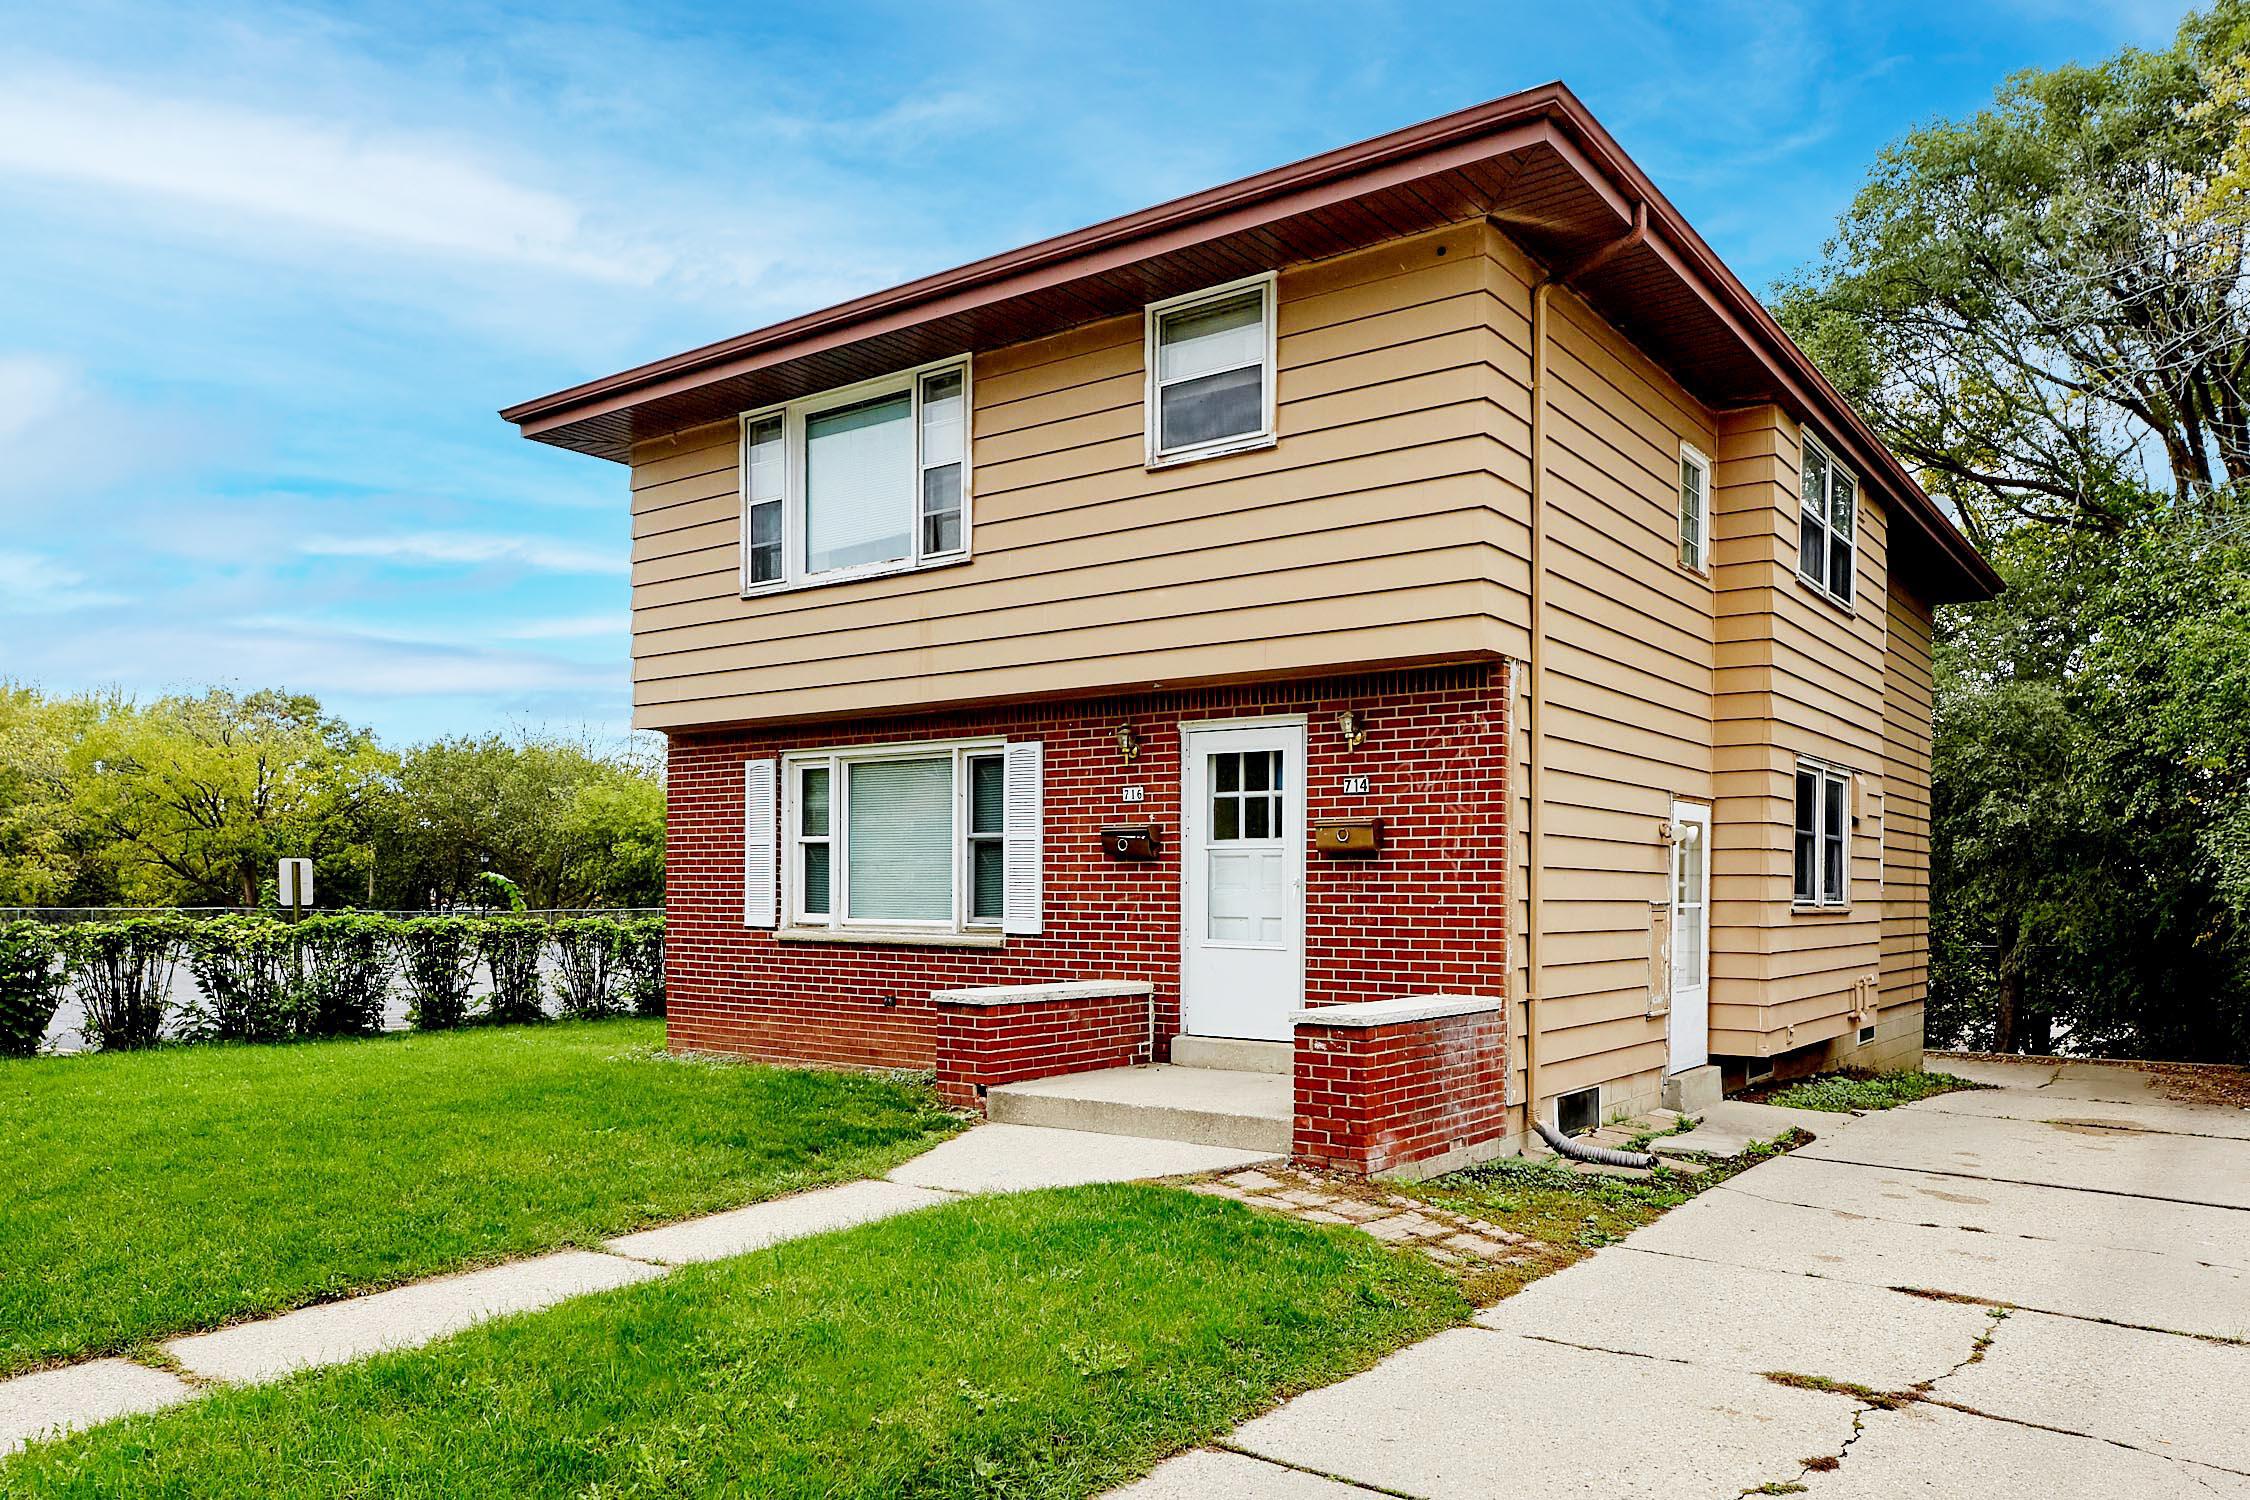 714 John St, Waukesha, Wisconsin 53188, 3 Bedrooms Bedrooms, 5 Rooms Rooms,1 BathroomBathrooms,Two-Family,For Sale,John St,1,1768232